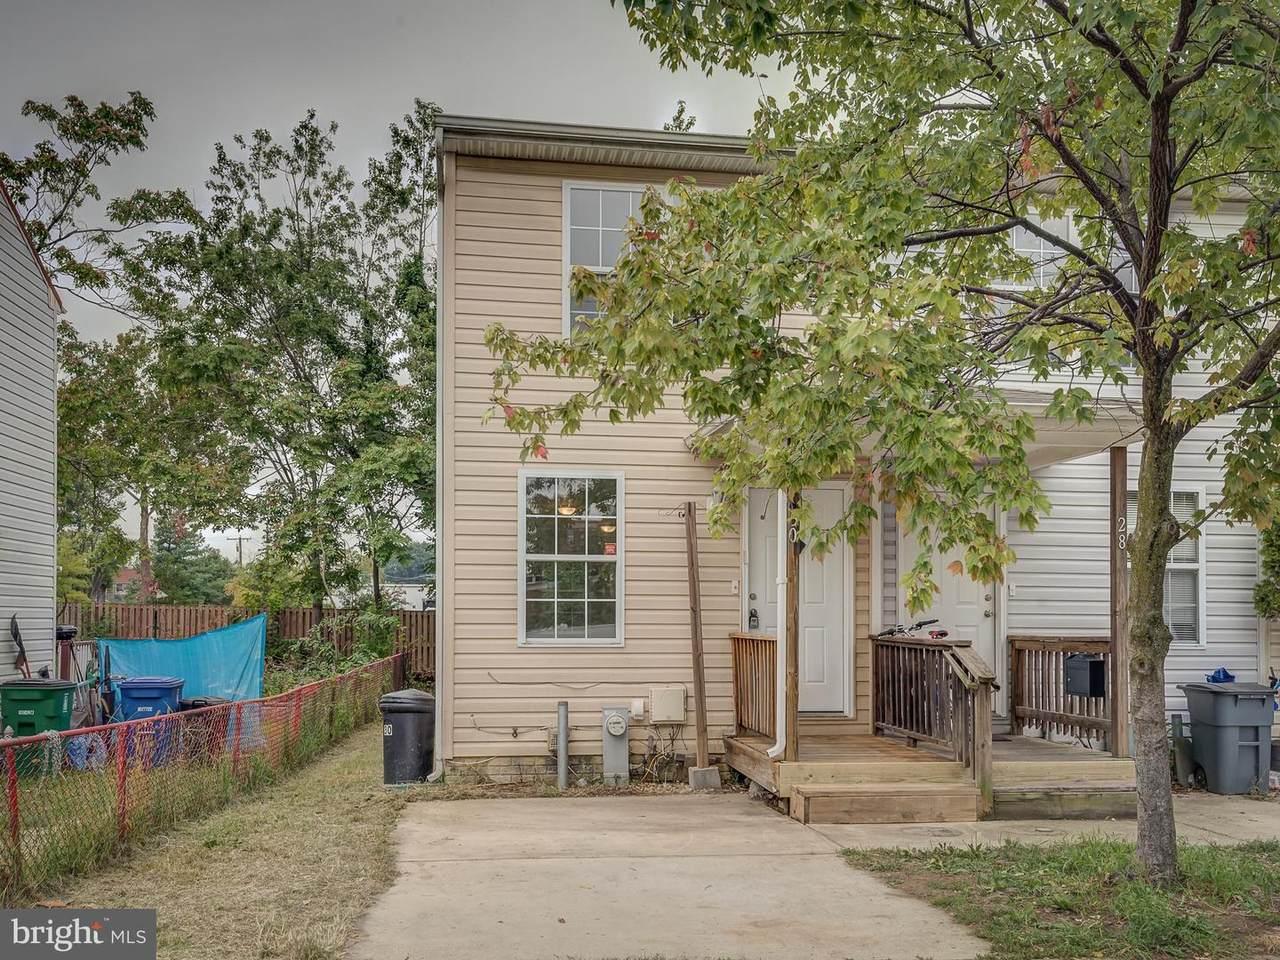 30 Johnson Place - Photo 1